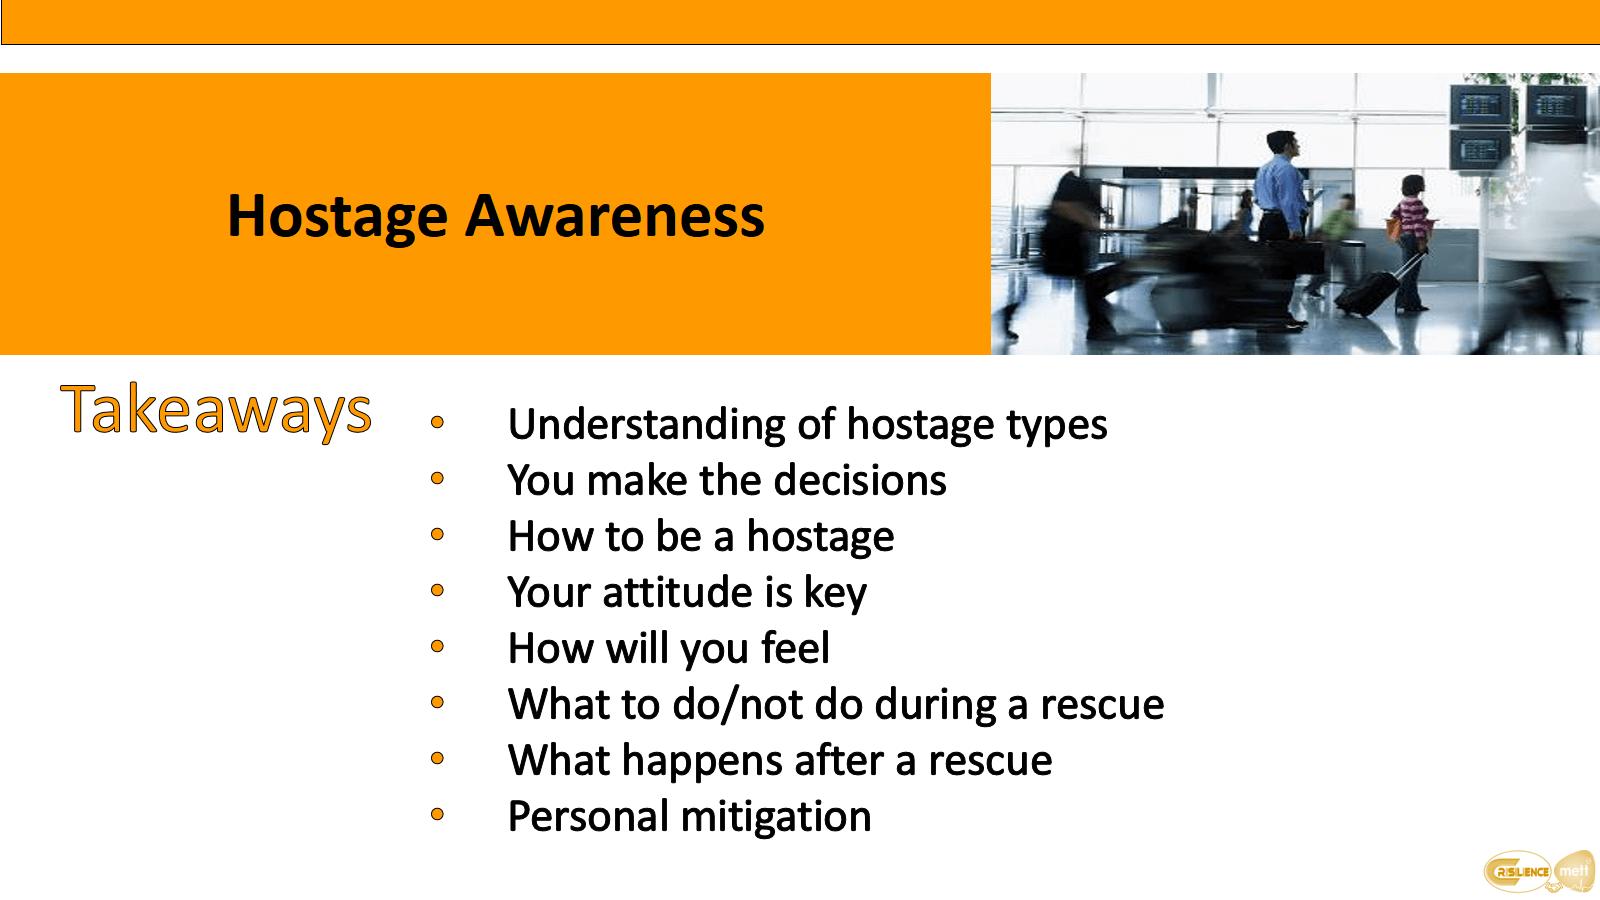 CIMAT slide 13 Hostage awareness takeaways